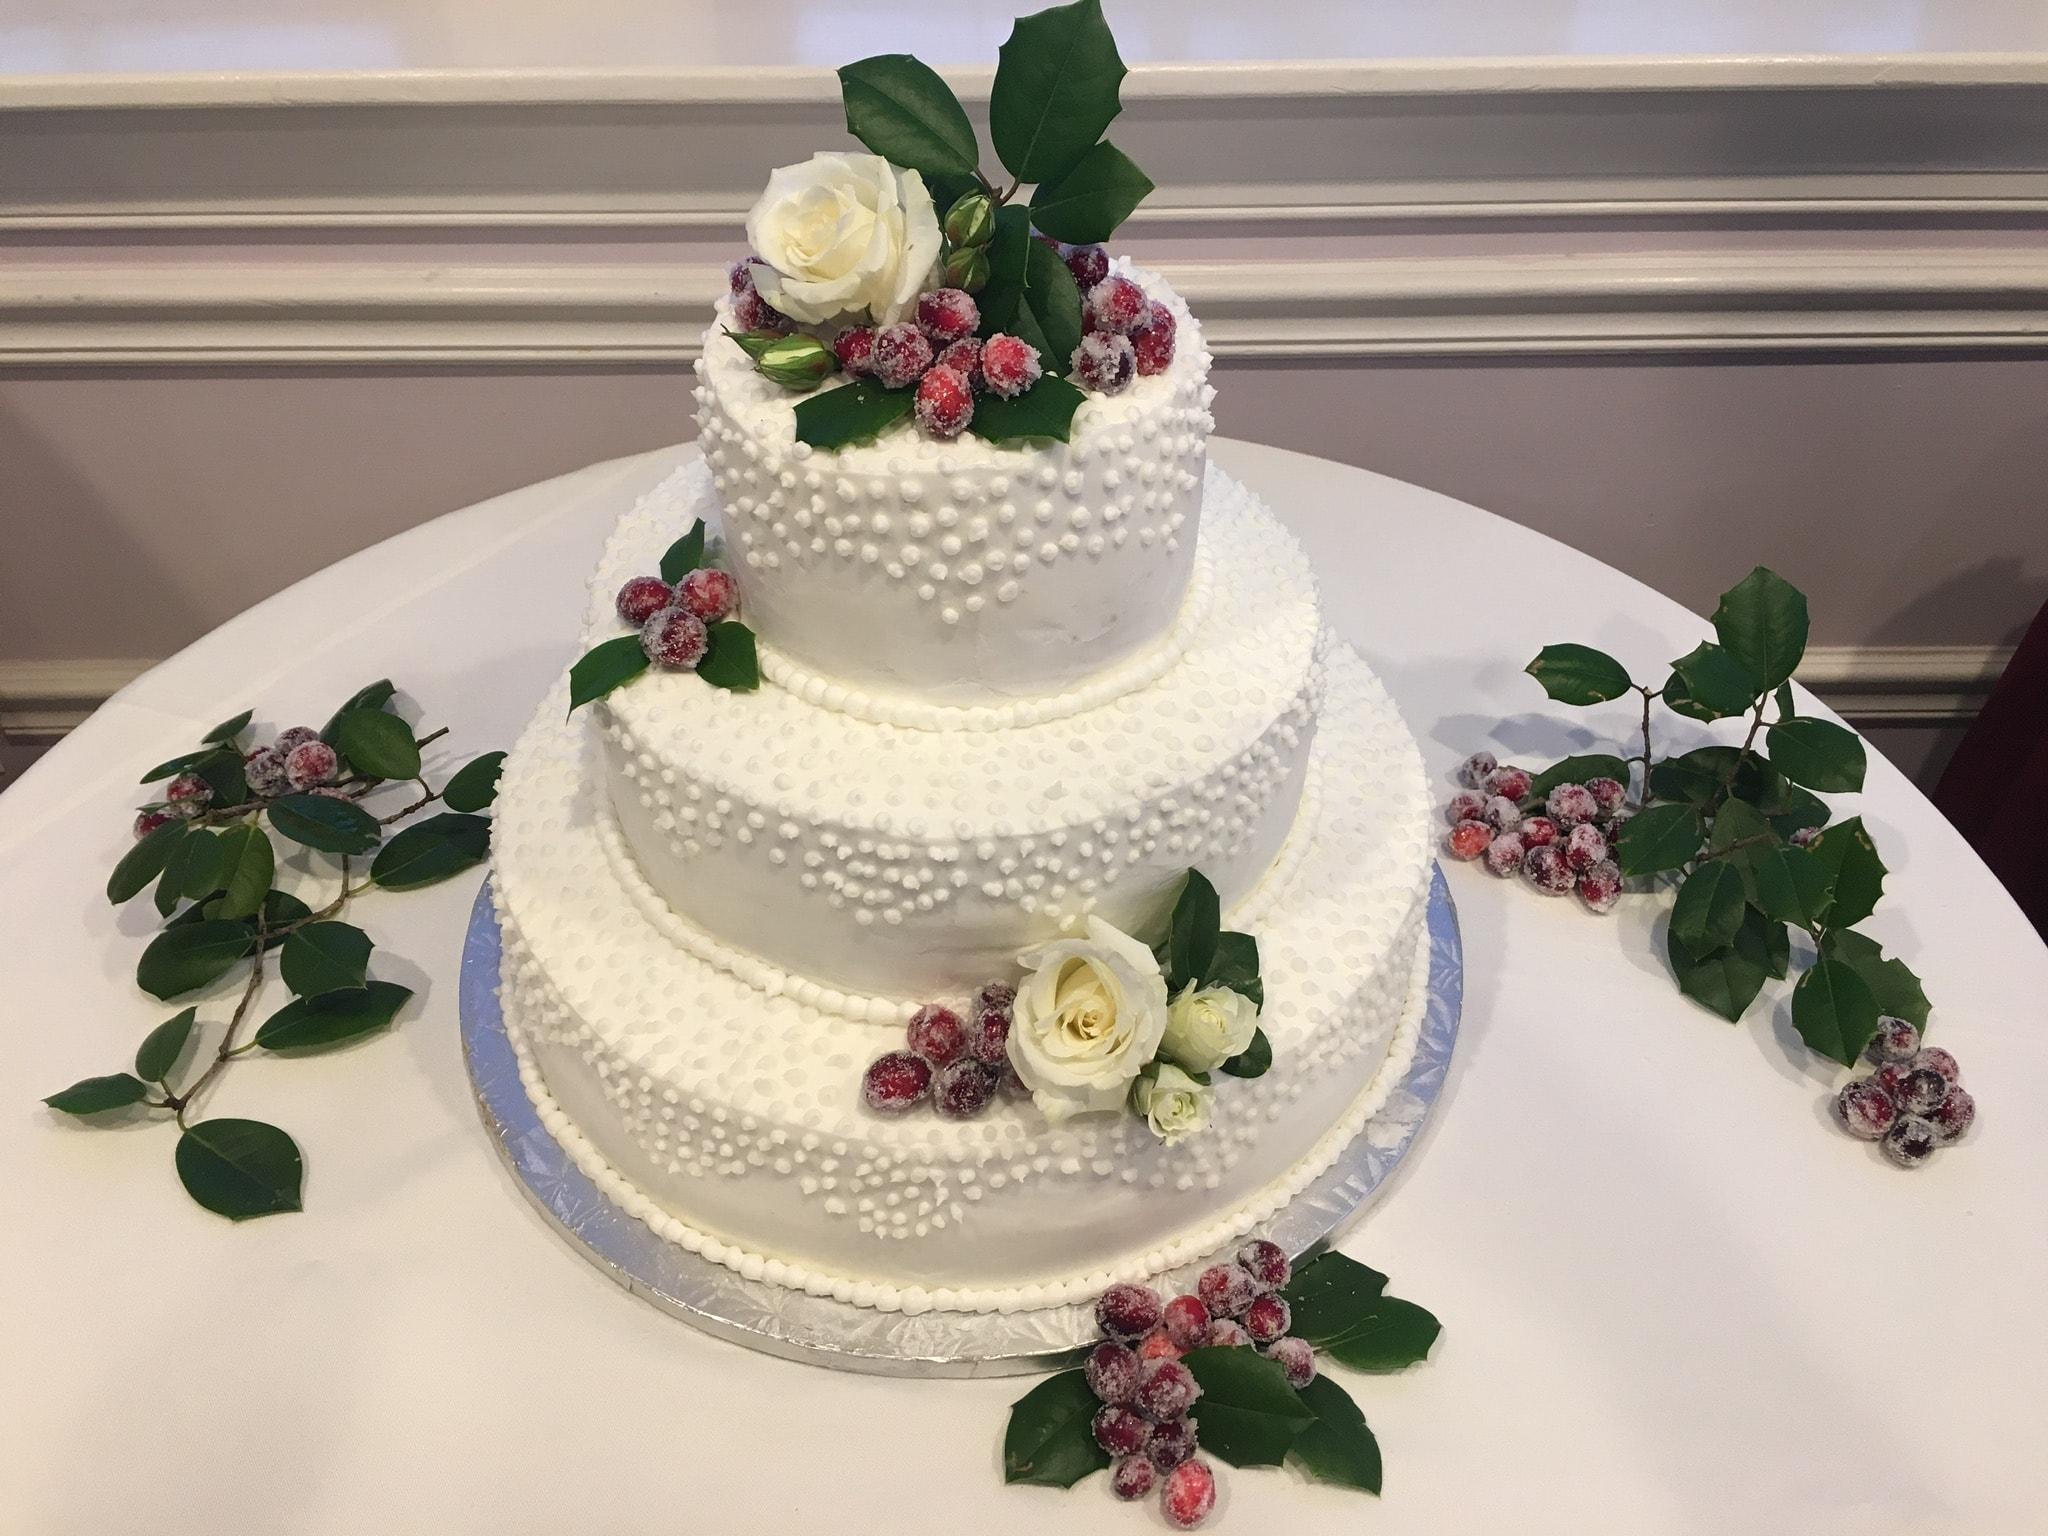 Winter Wonderland Wedding Cake with Sugared Cranberries